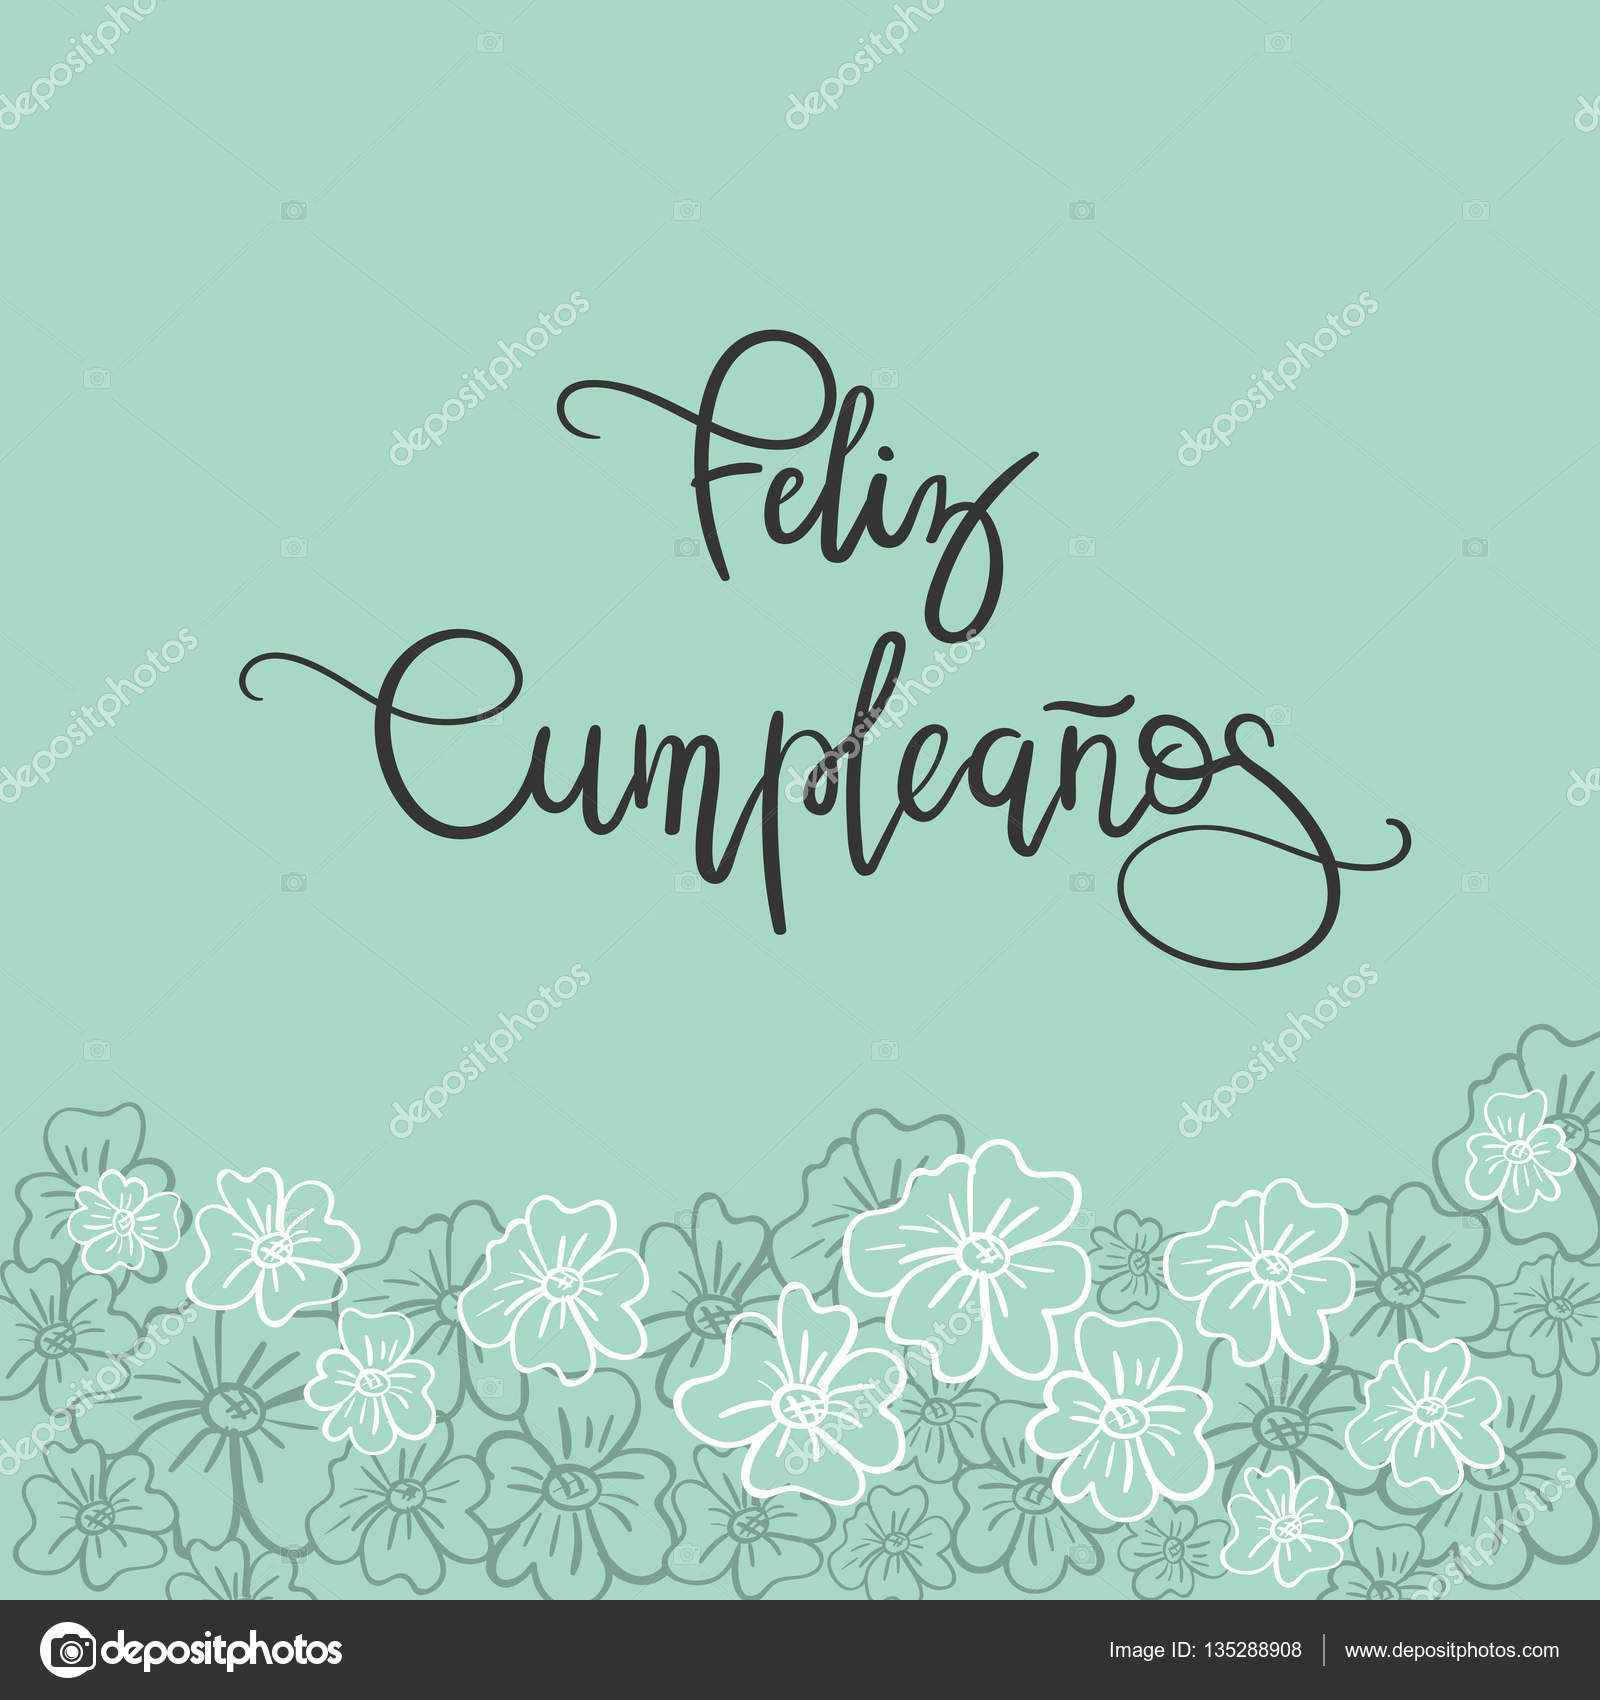 Feliz Cumpleanos Happy Birthday Spanish Text Greeting Card